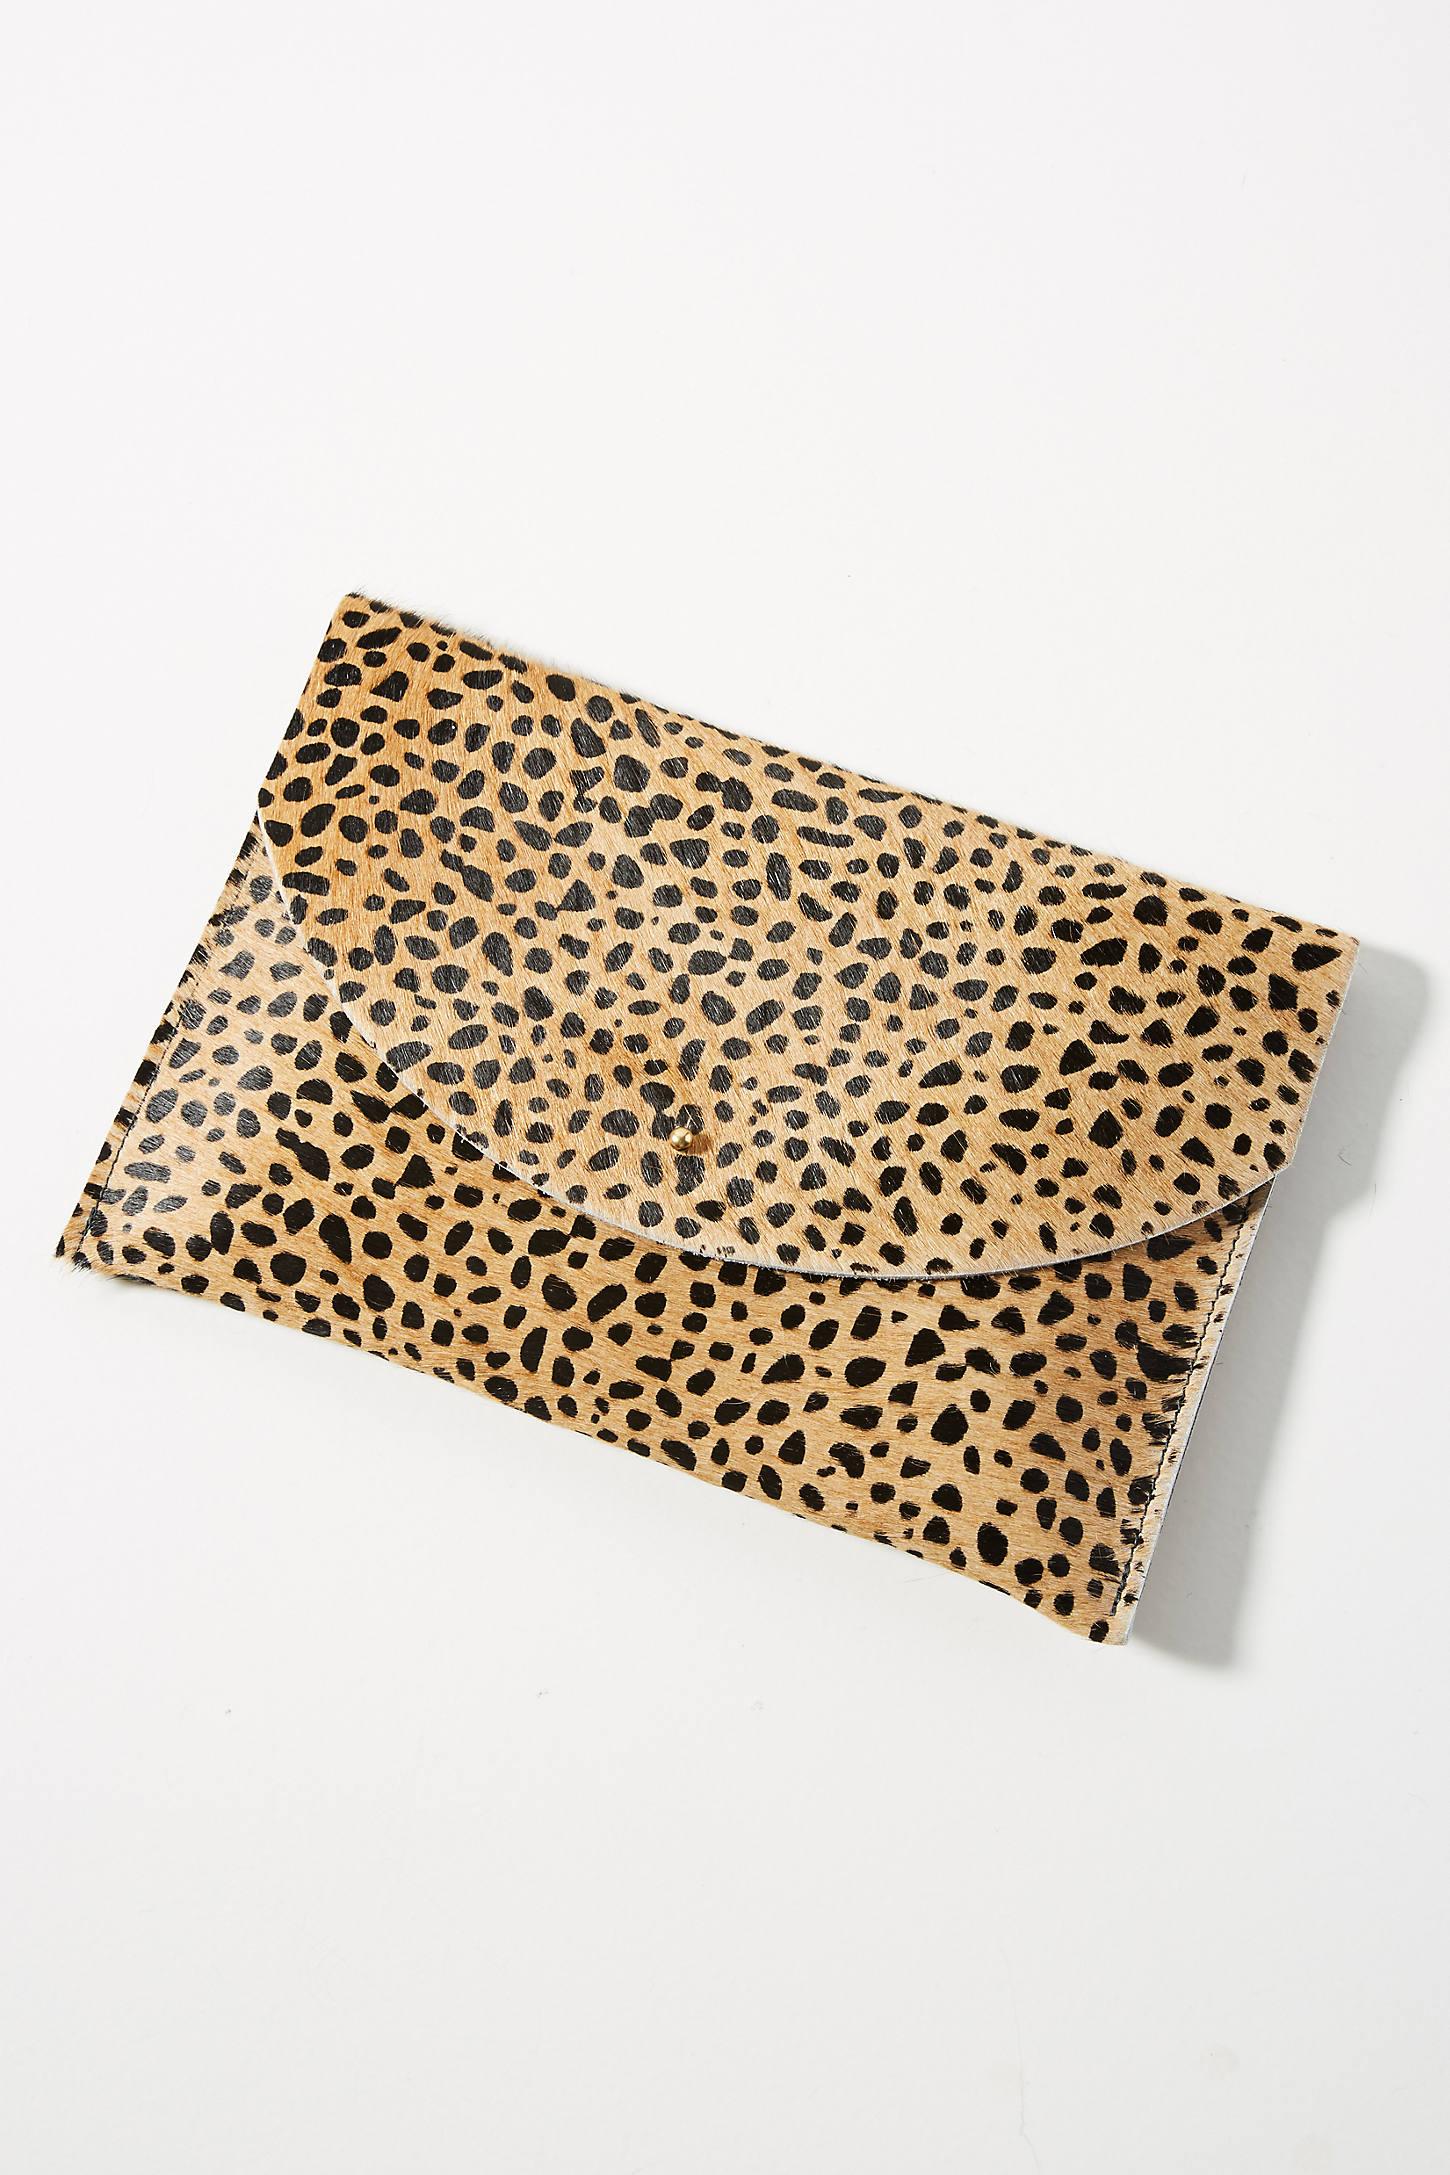 Primecut Envelope Clutch